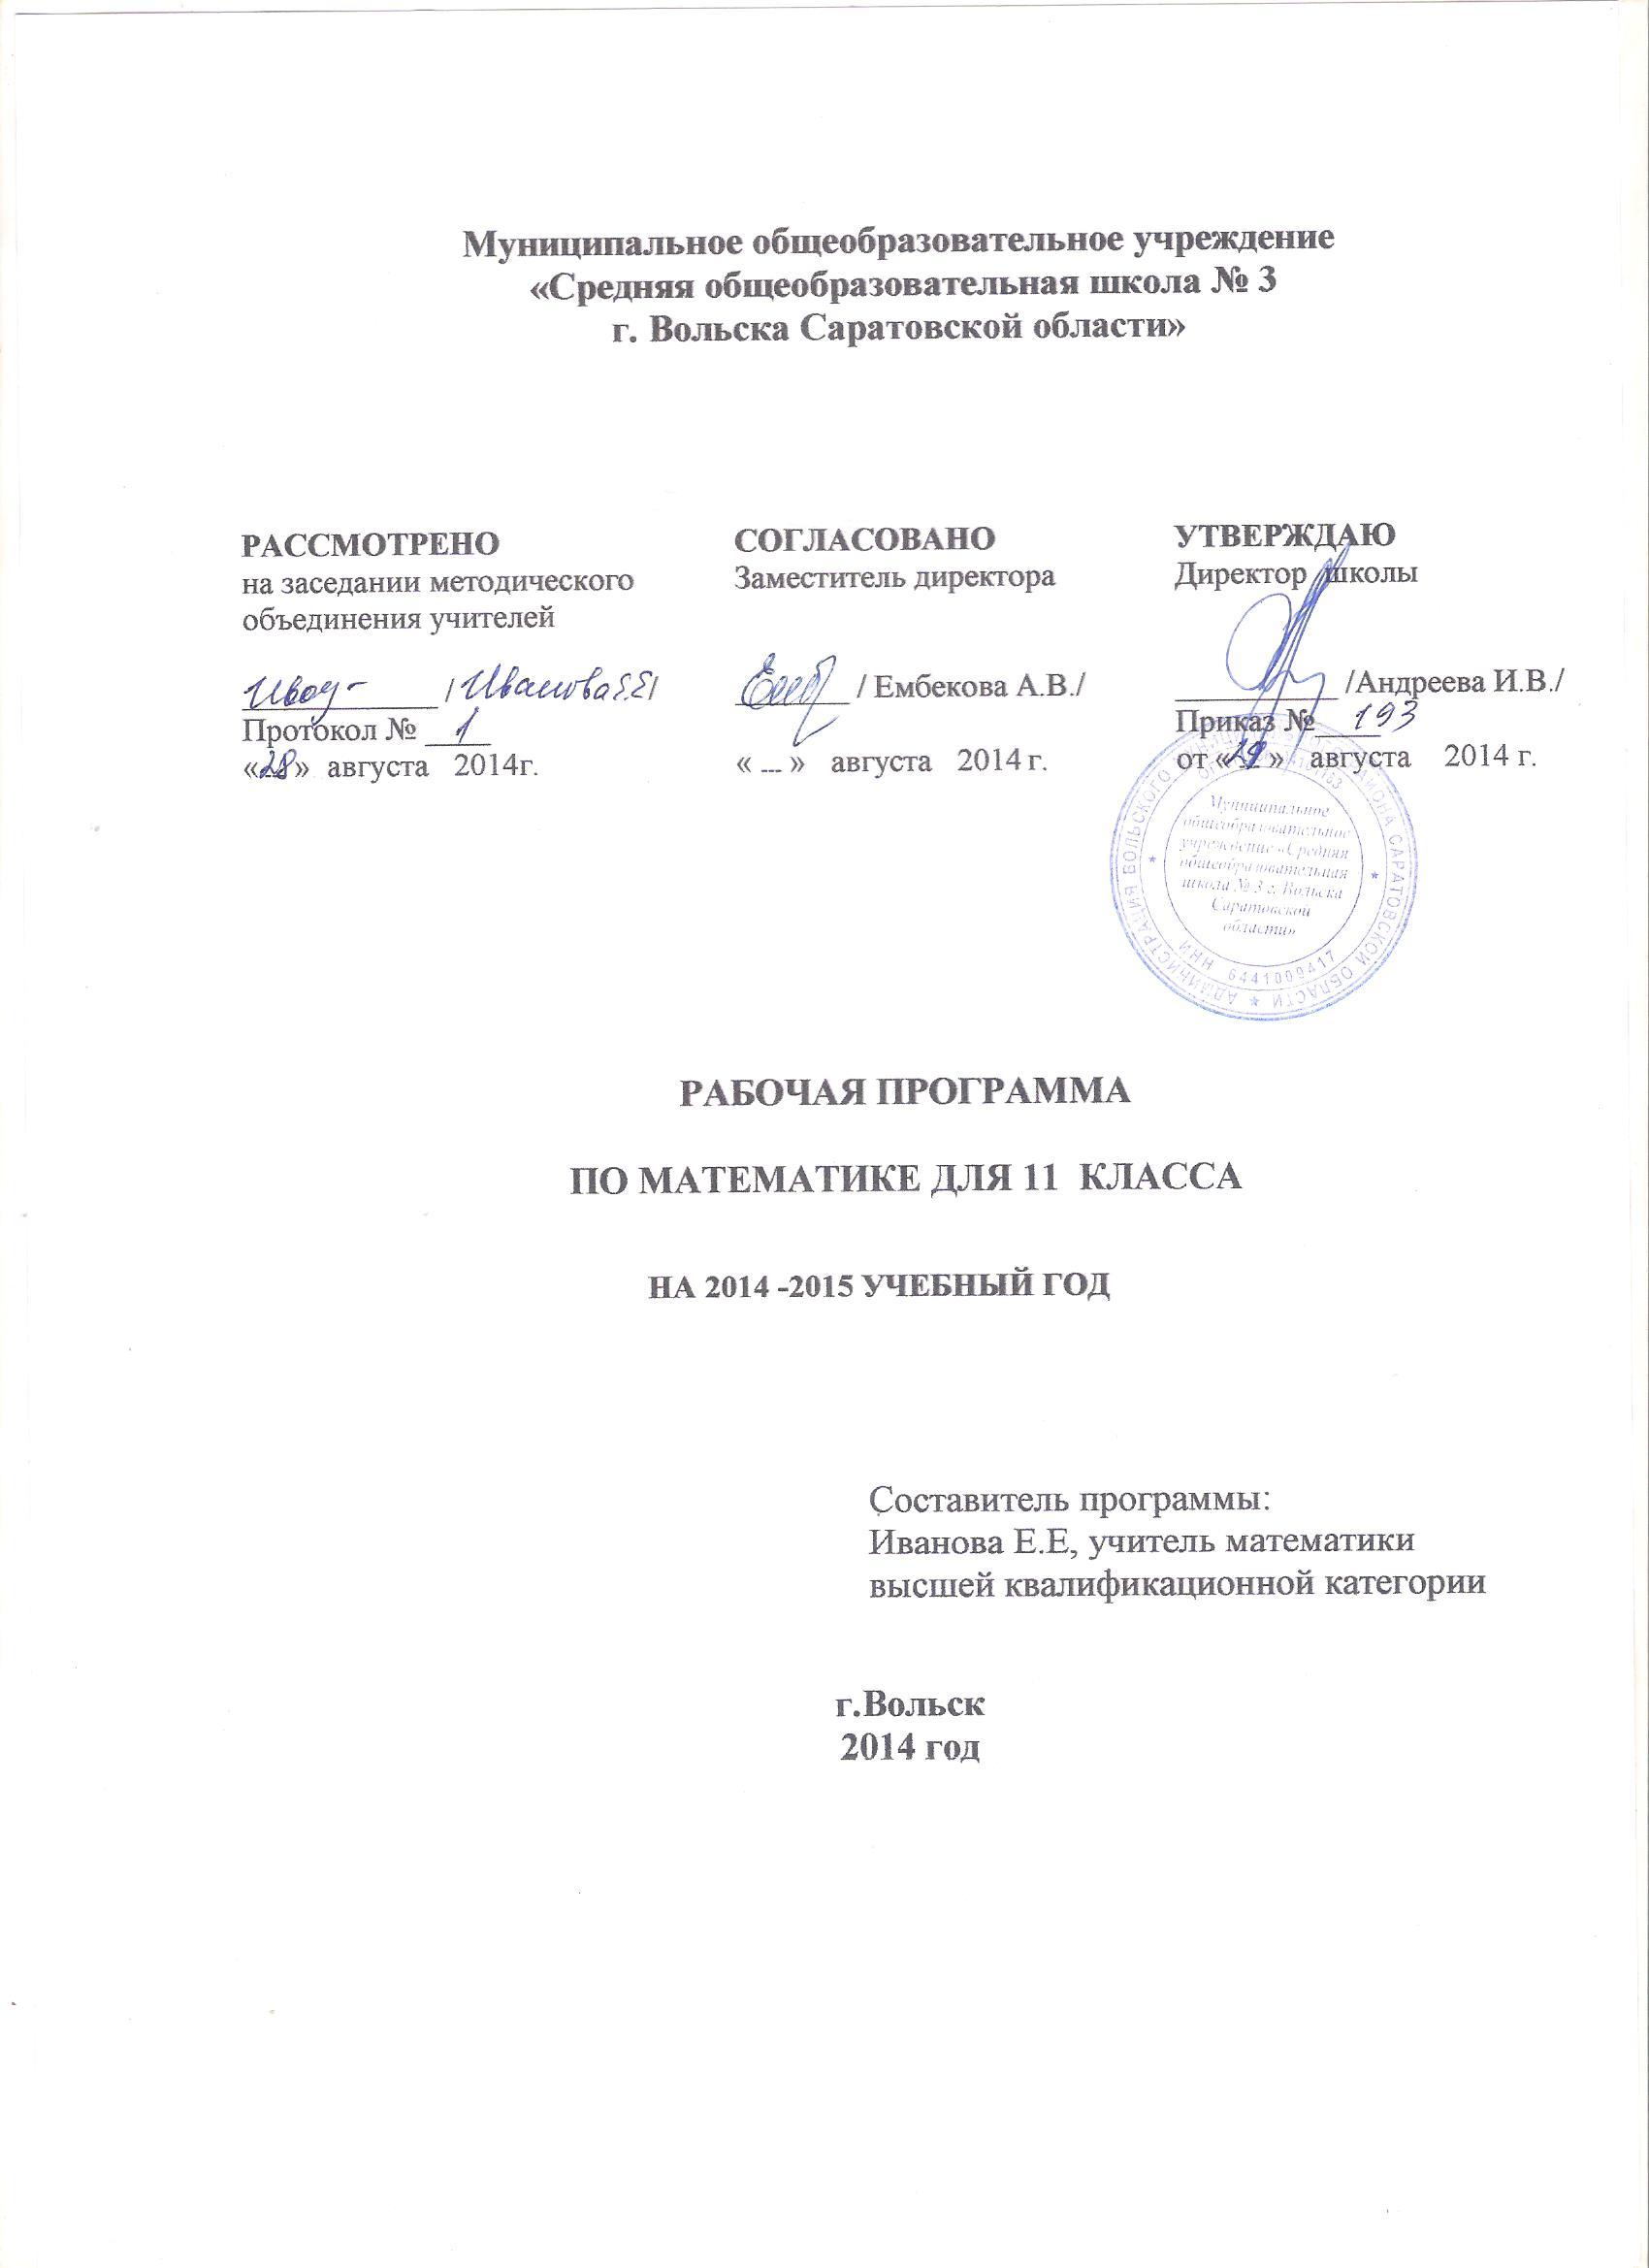 C:\Users\Елена\Documents\рабочие программы 2014-2015\титулы 2014\2014-09-05 11 класс 14\11 класс 14 001.jpg